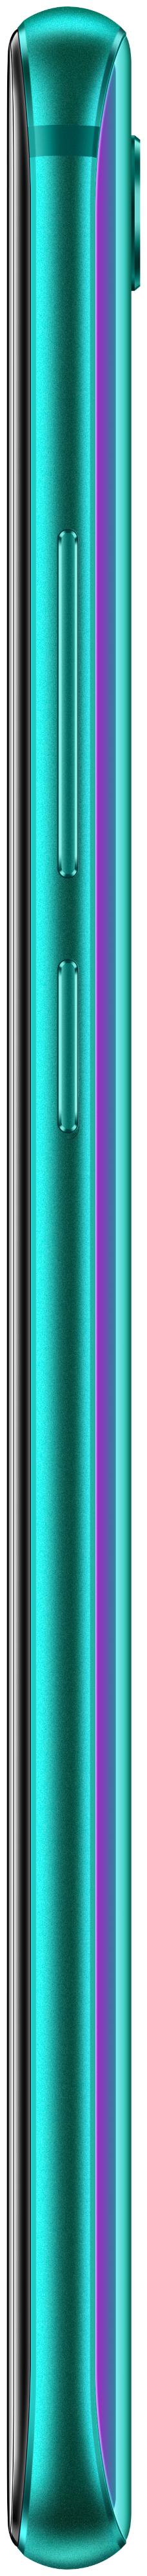 HONOR 10 4/64GB - беспроводные интерфейсы: NFC, Wi-Fi, Bluetooth 4.2